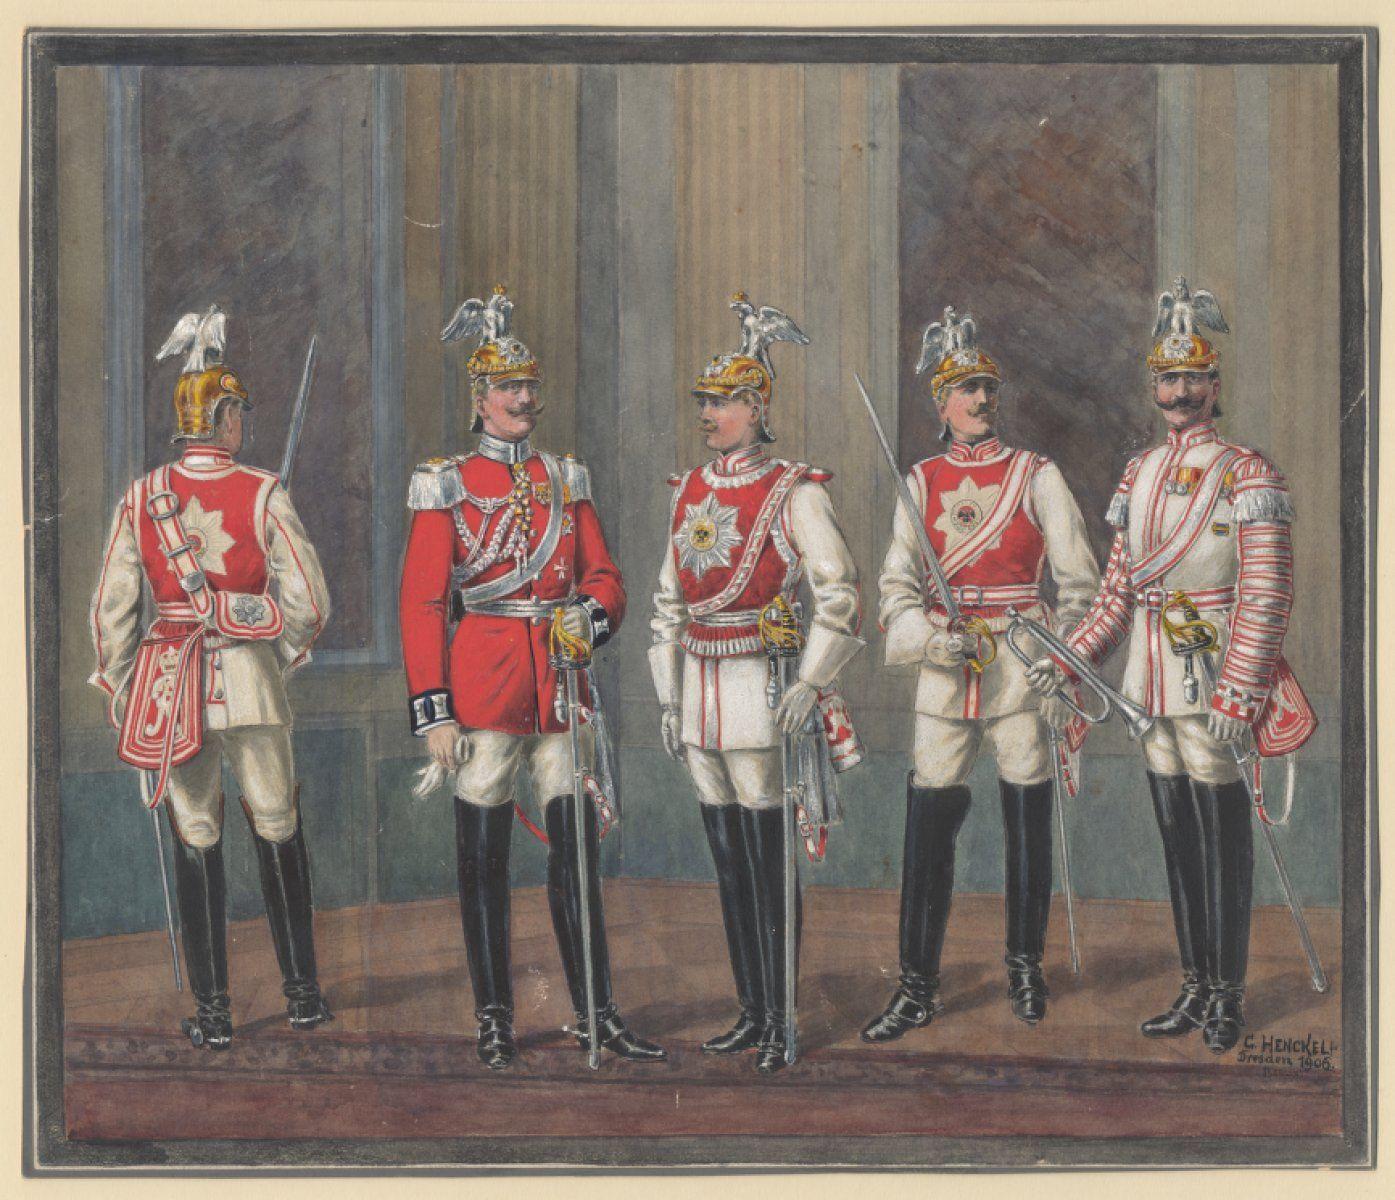 german garde du corps palace and gala dress 1871 1918 german kurassier regiments. Black Bedroom Furniture Sets. Home Design Ideas